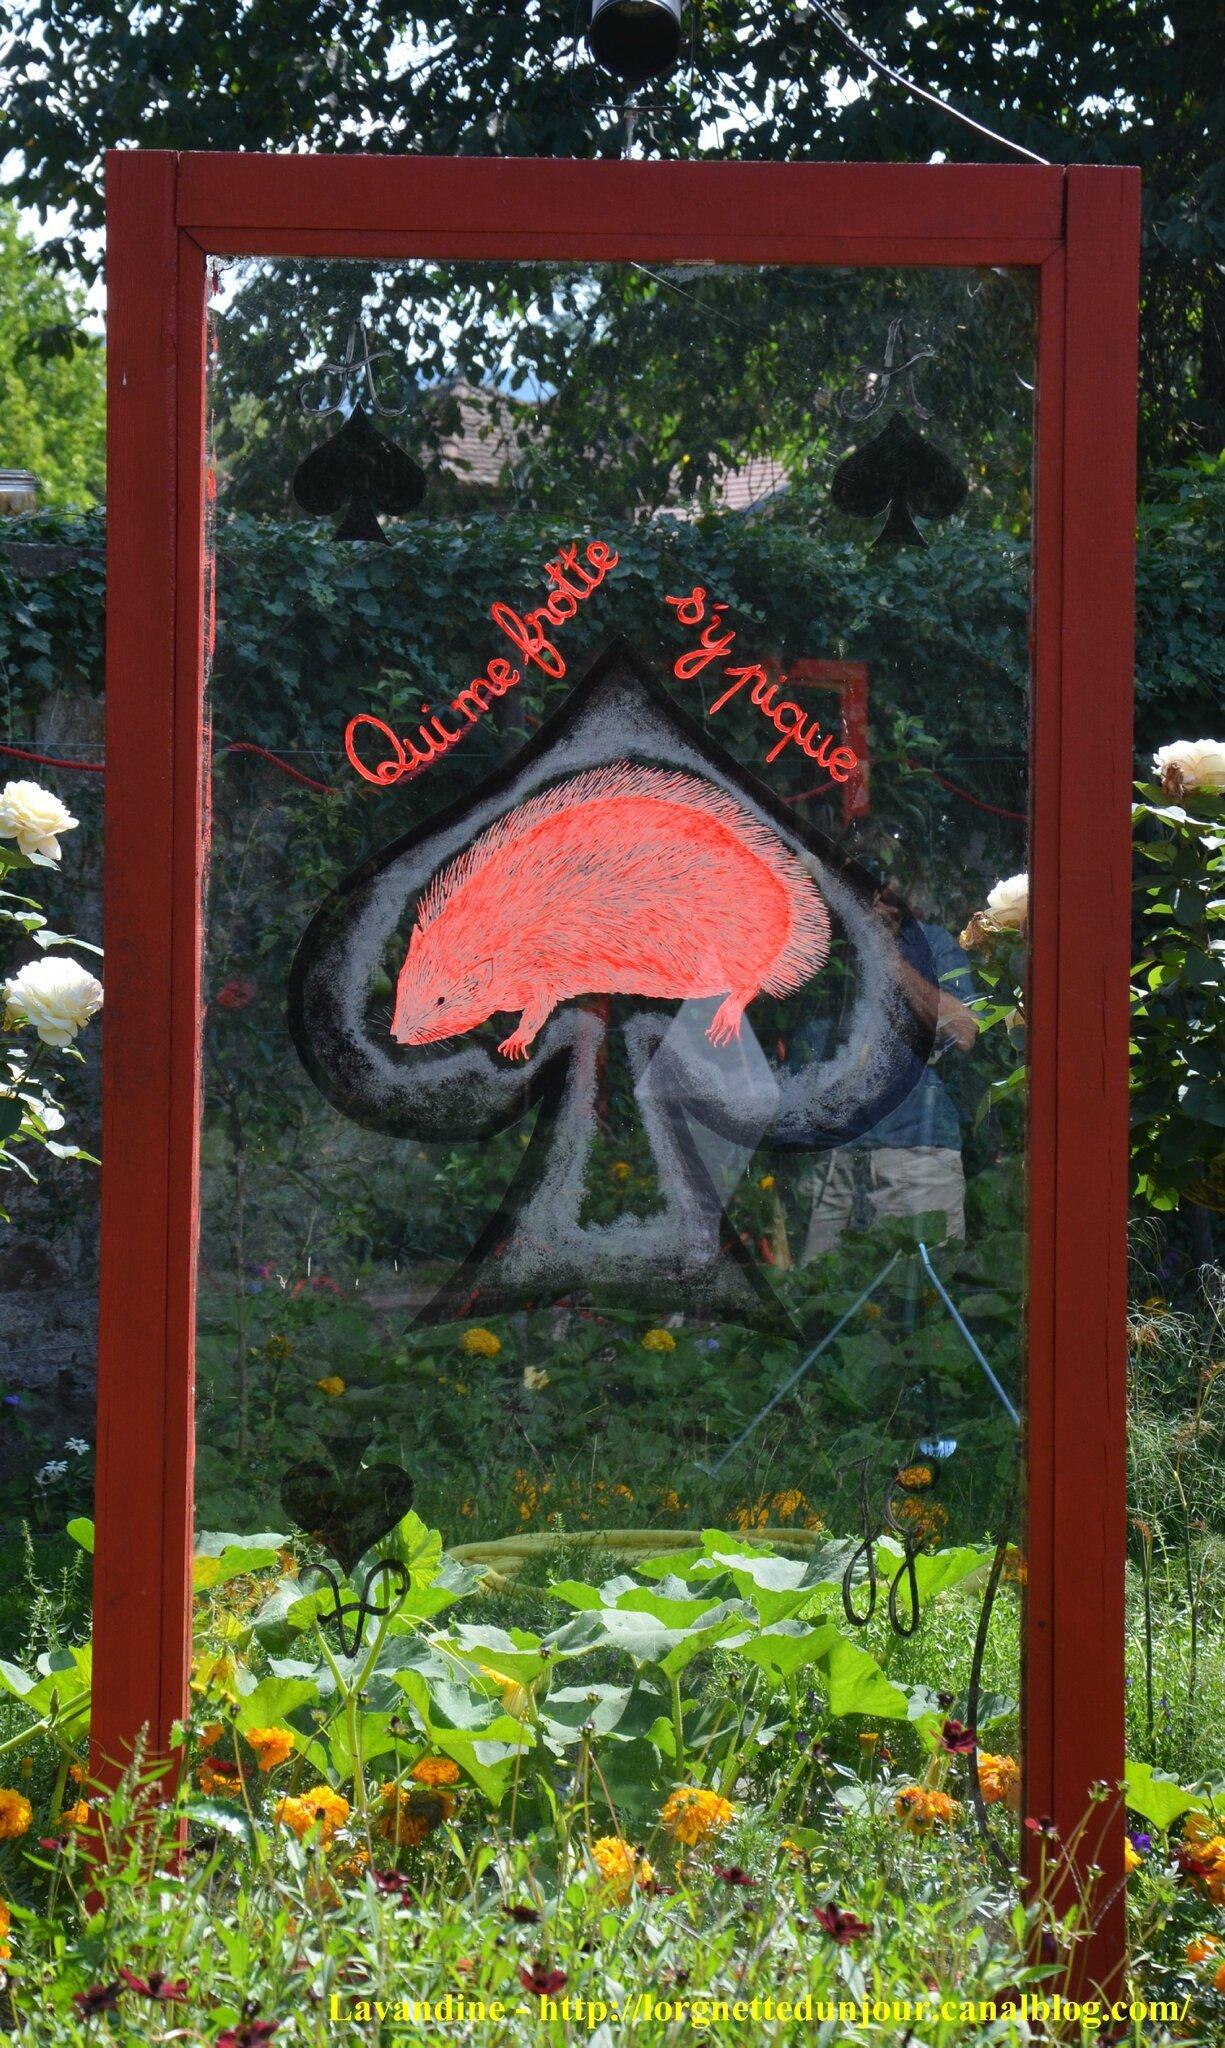 05/09/12 : Au pays d'Alice